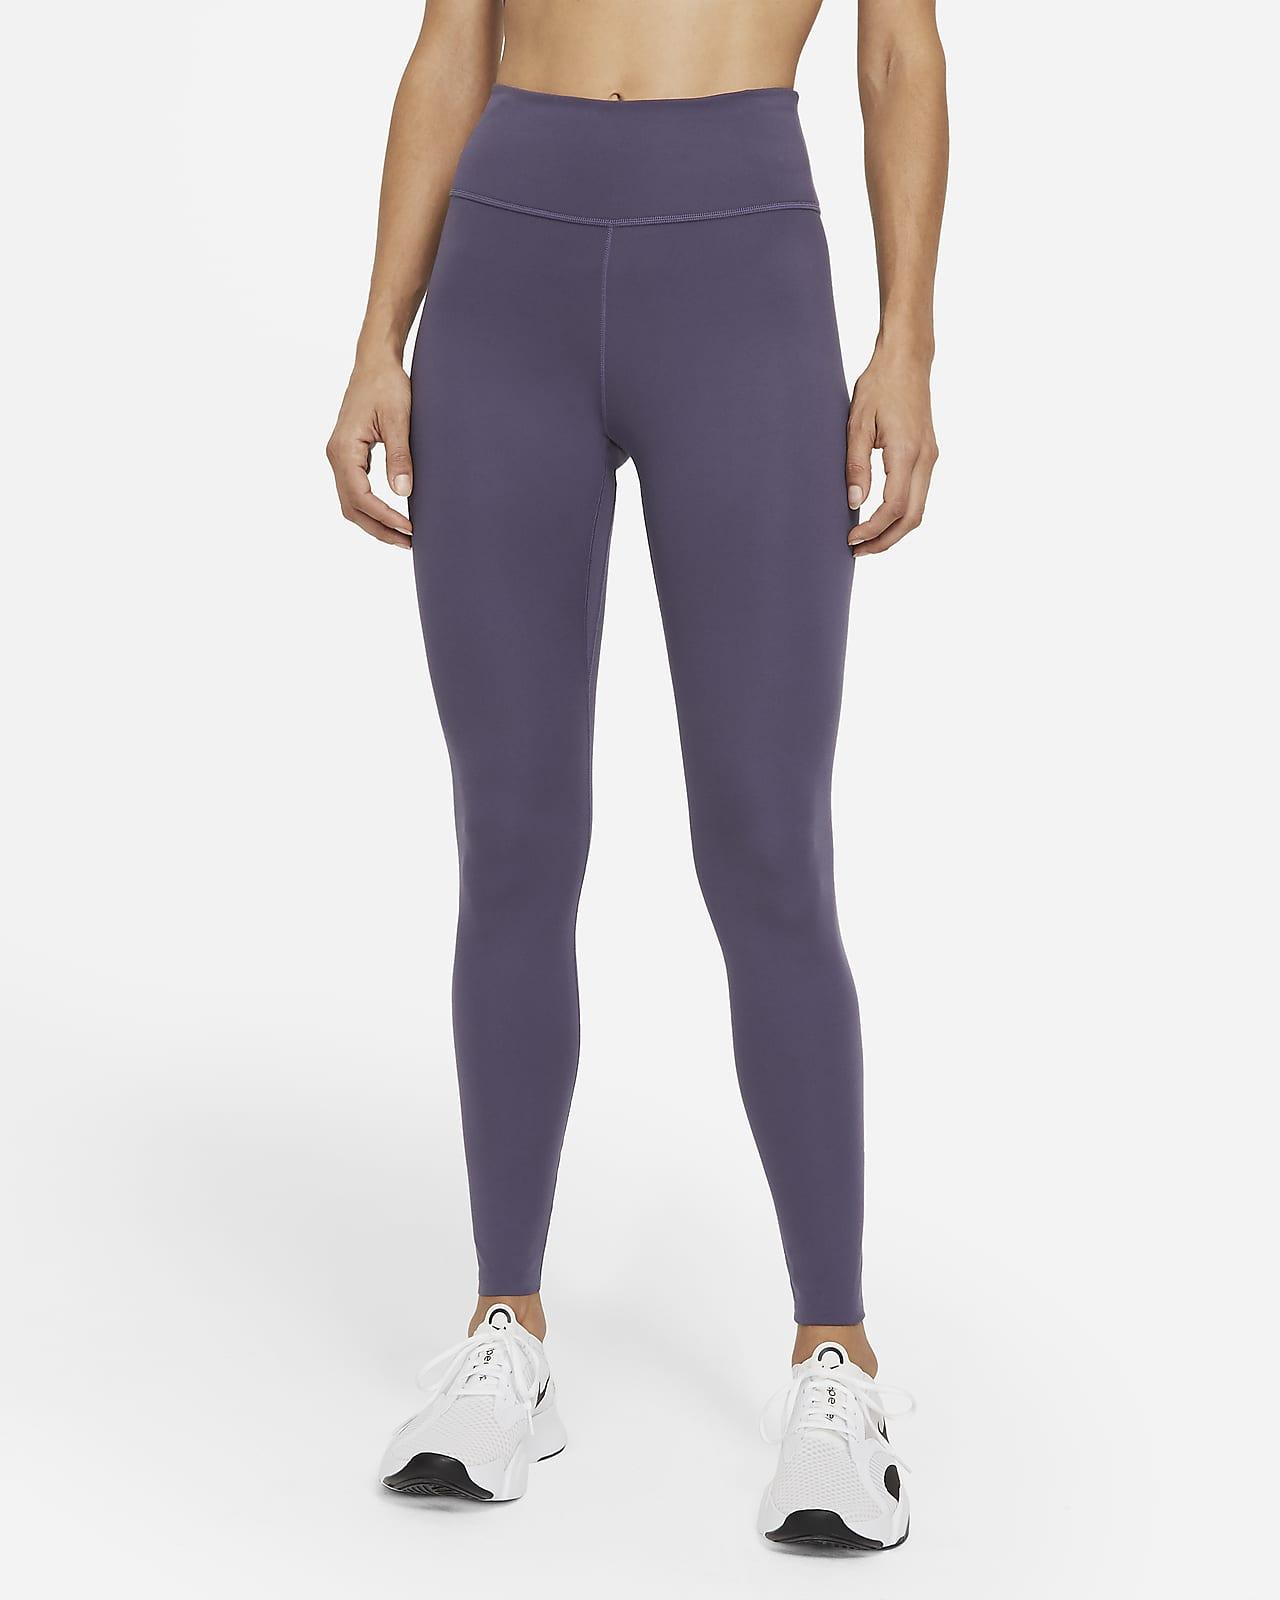 Leggings de cintura normal Nike One Luxe para mulher